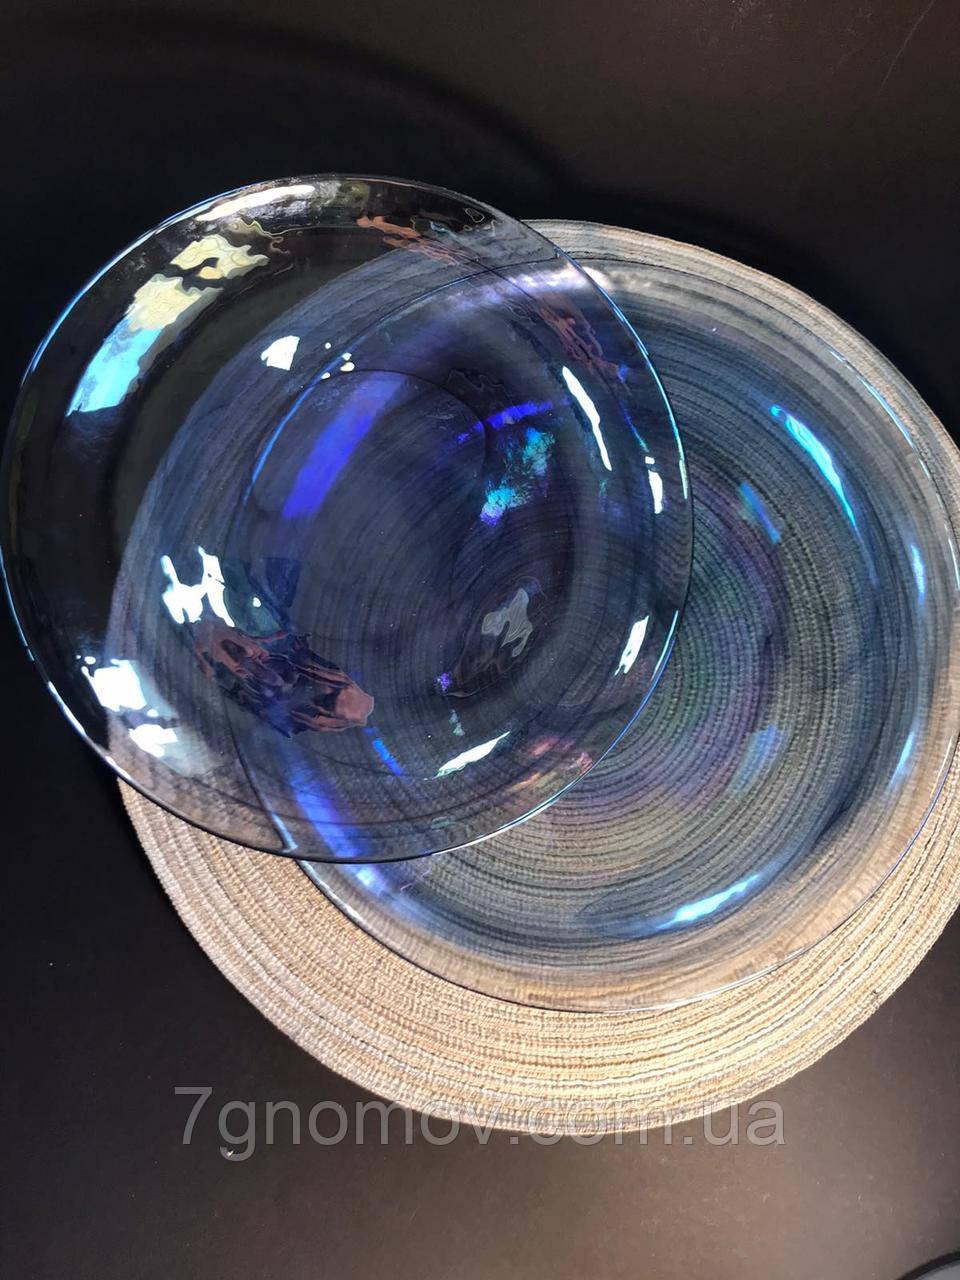 Набор 6 стеклянных обеденных тарелок прозрачно-синий Океан 27 см арт. 16112-14 - фото 3